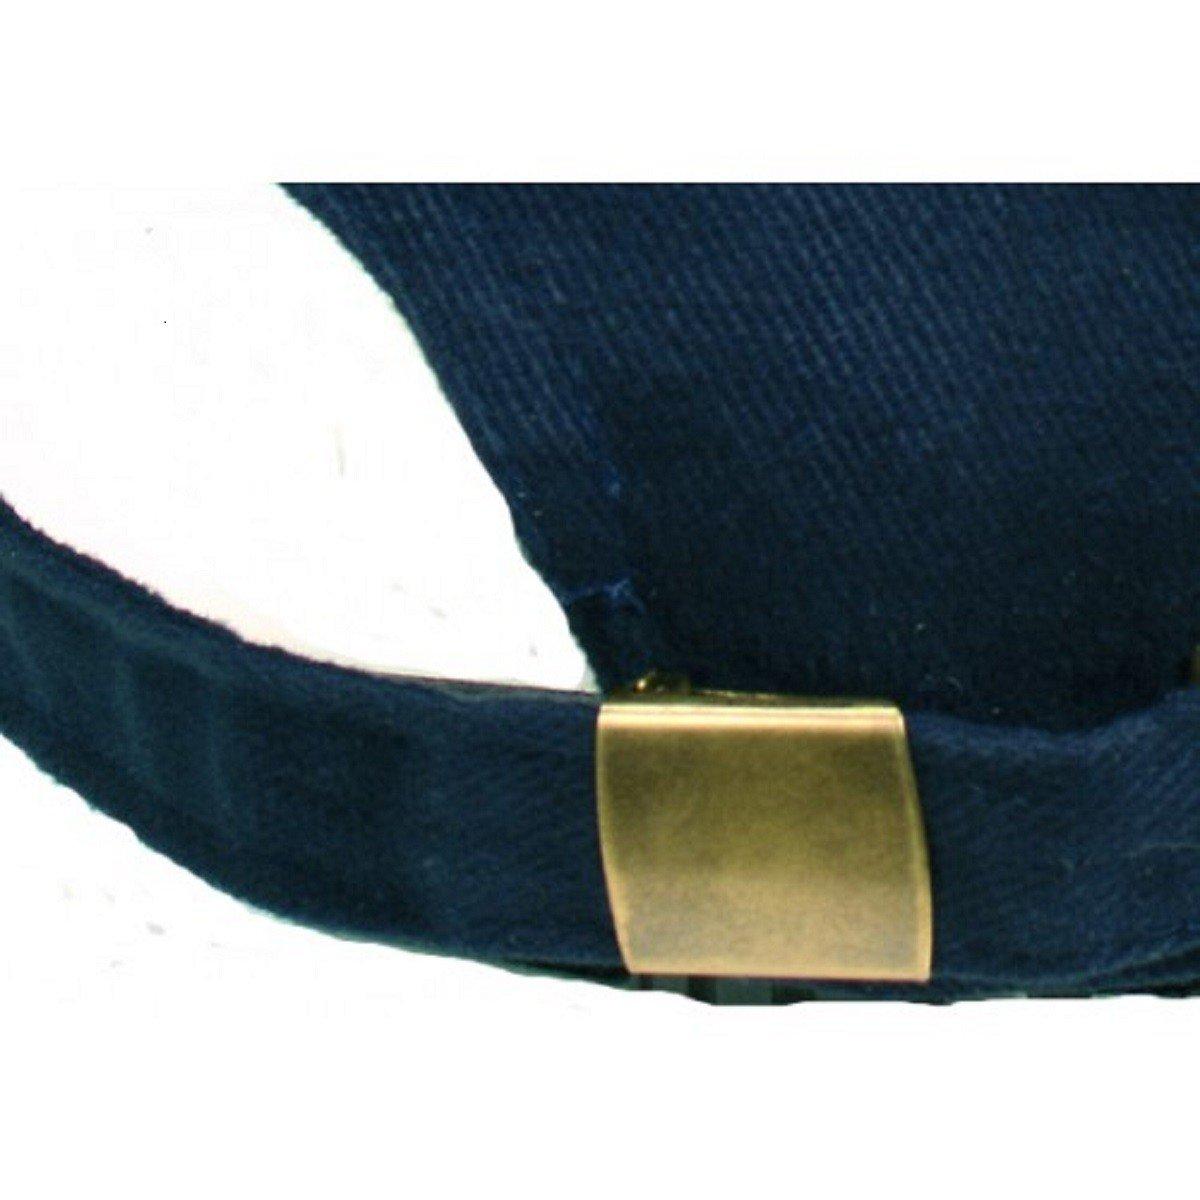 Kapitänsmütze Cap FIRST MATE Nauticalia London